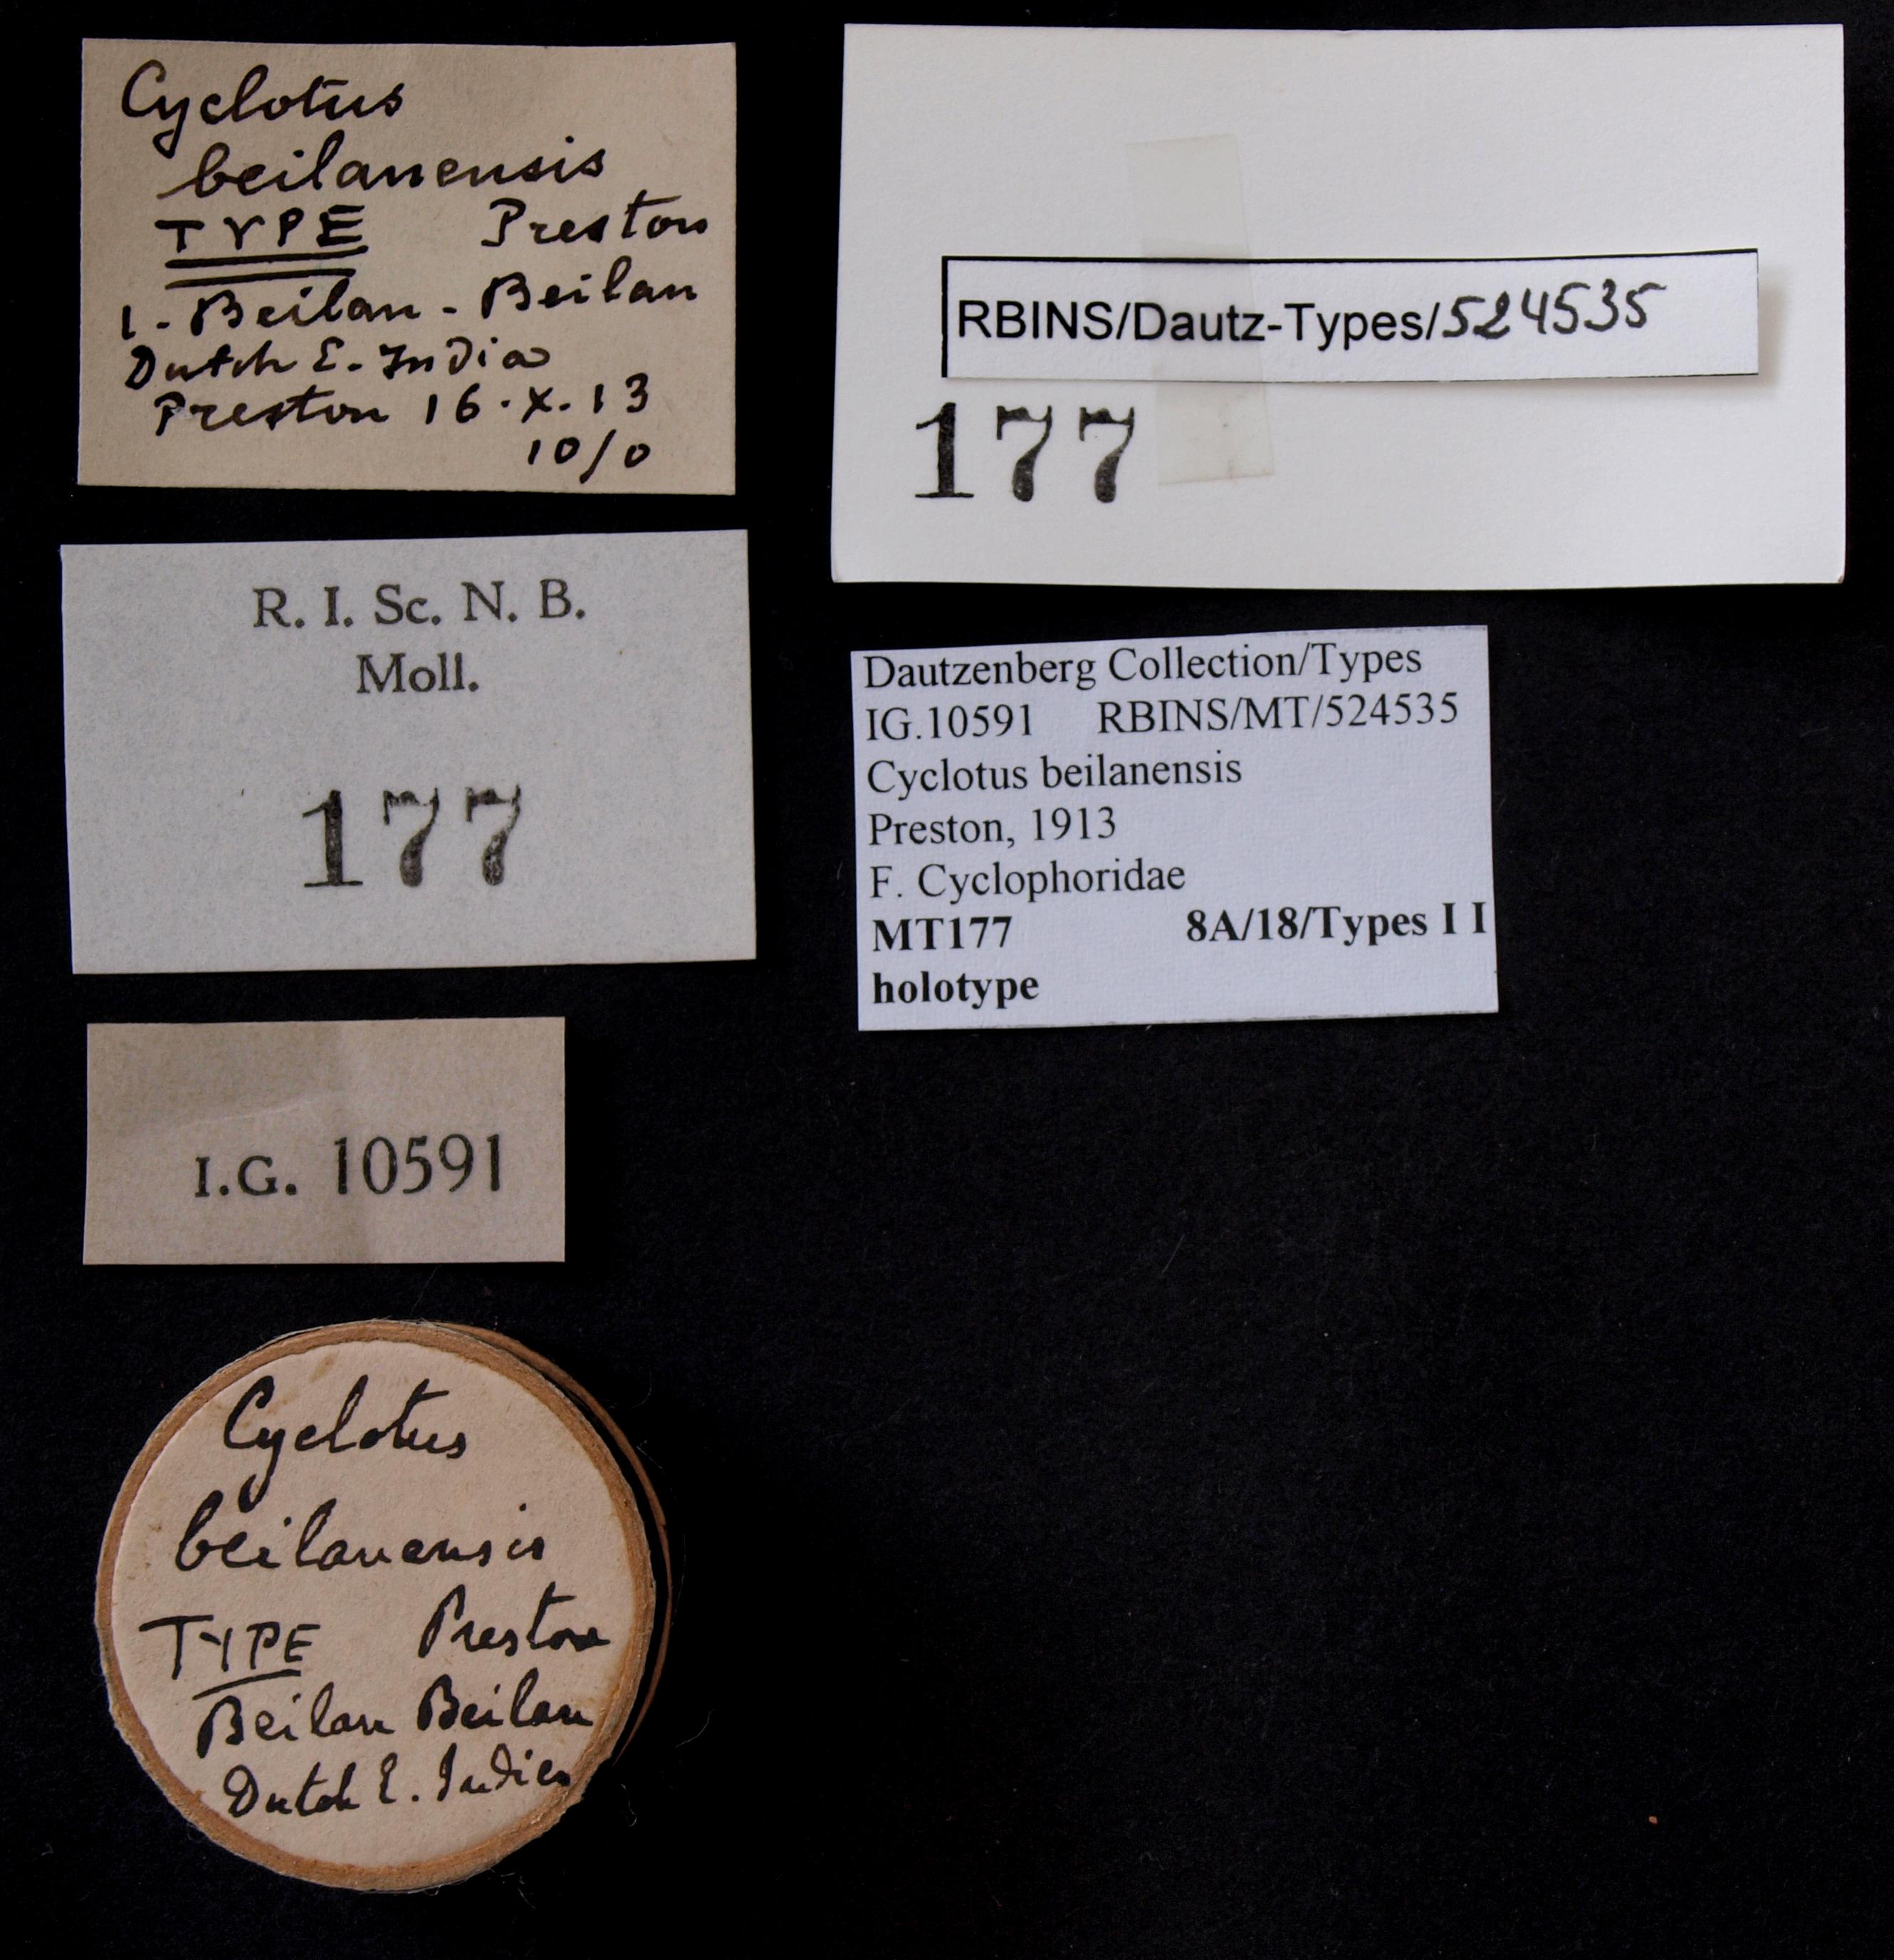 0177 Cyclotus beilanensis Ht Lb.JPG